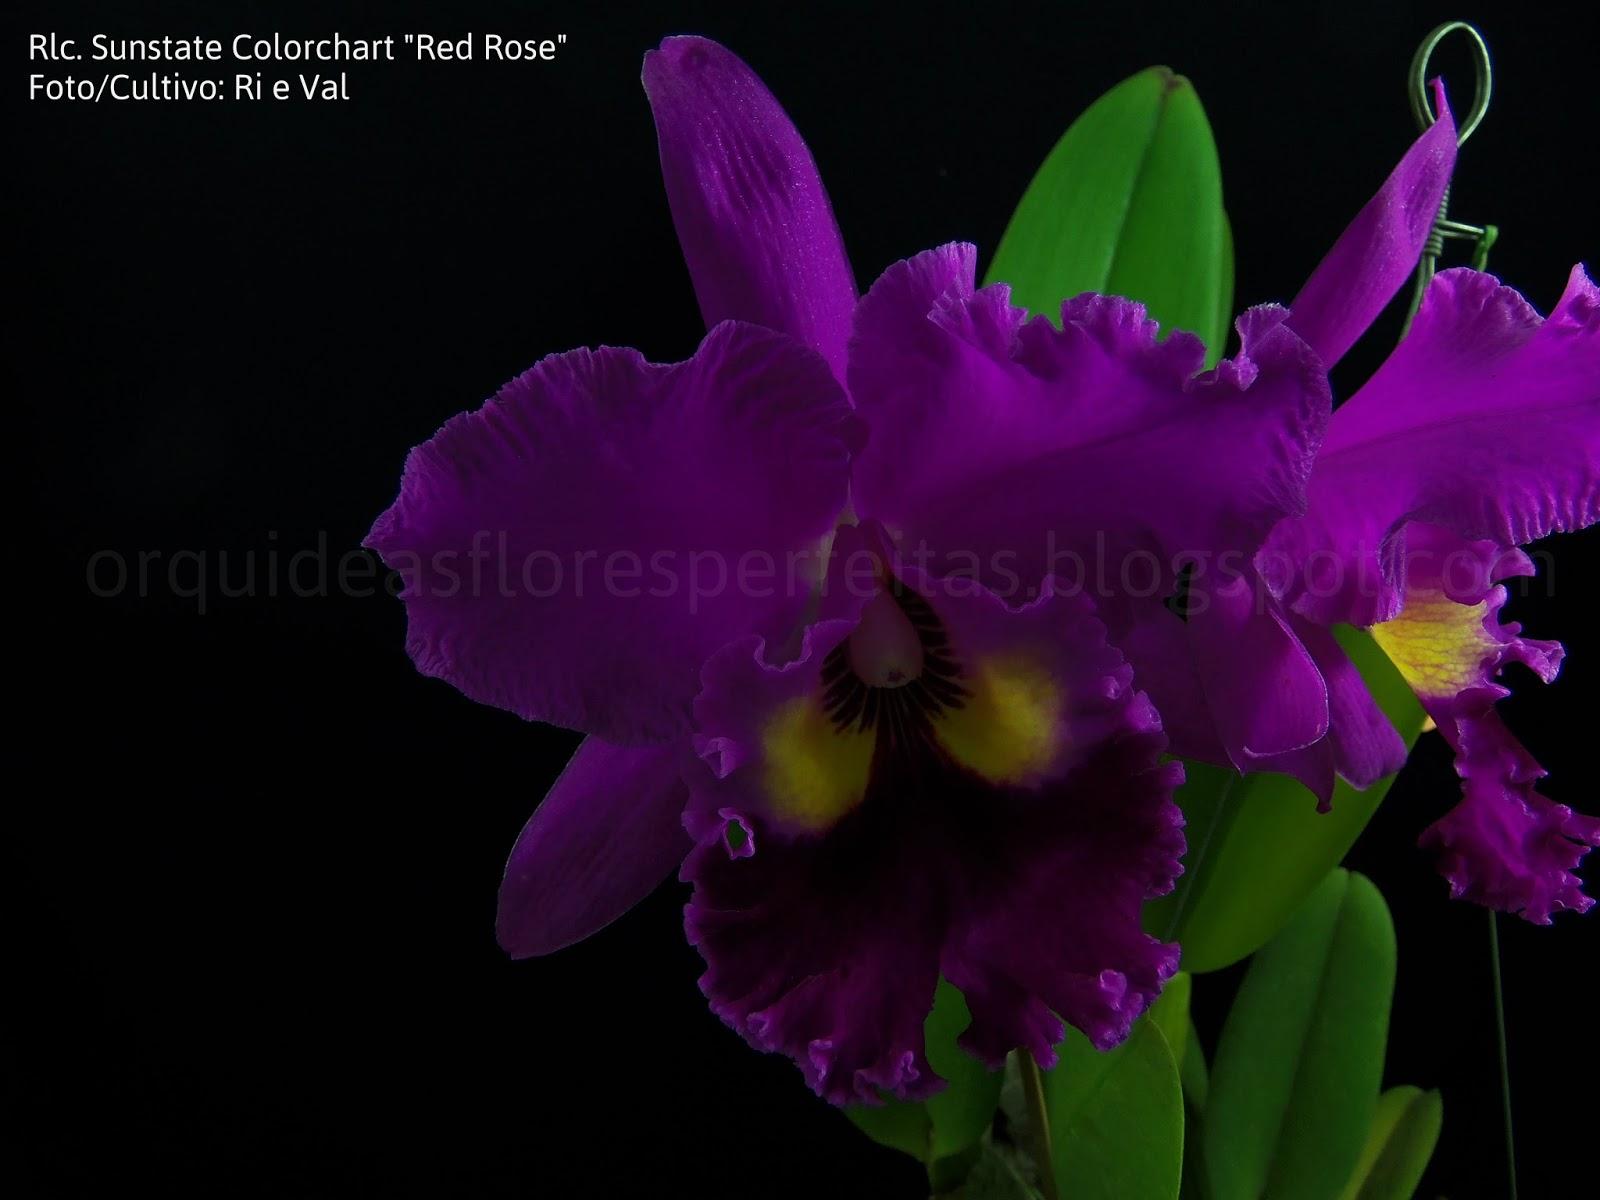 Rhyncholaeliocattleya Sunstate Colorchart Red Rose Orqudeas